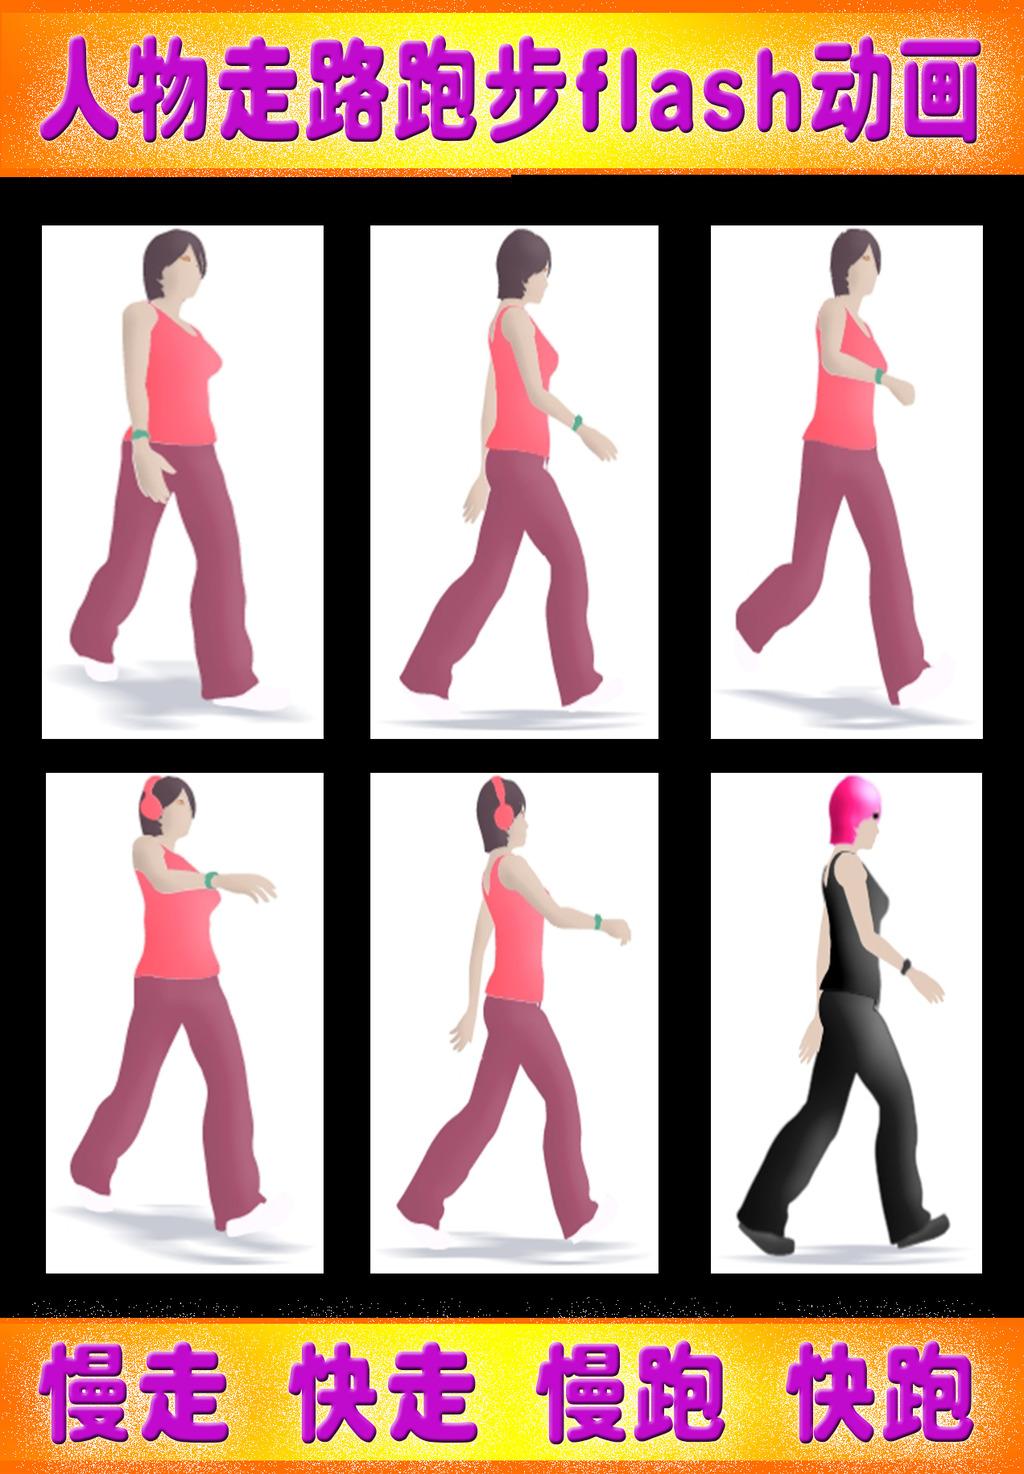 人物走路跑步flash动画